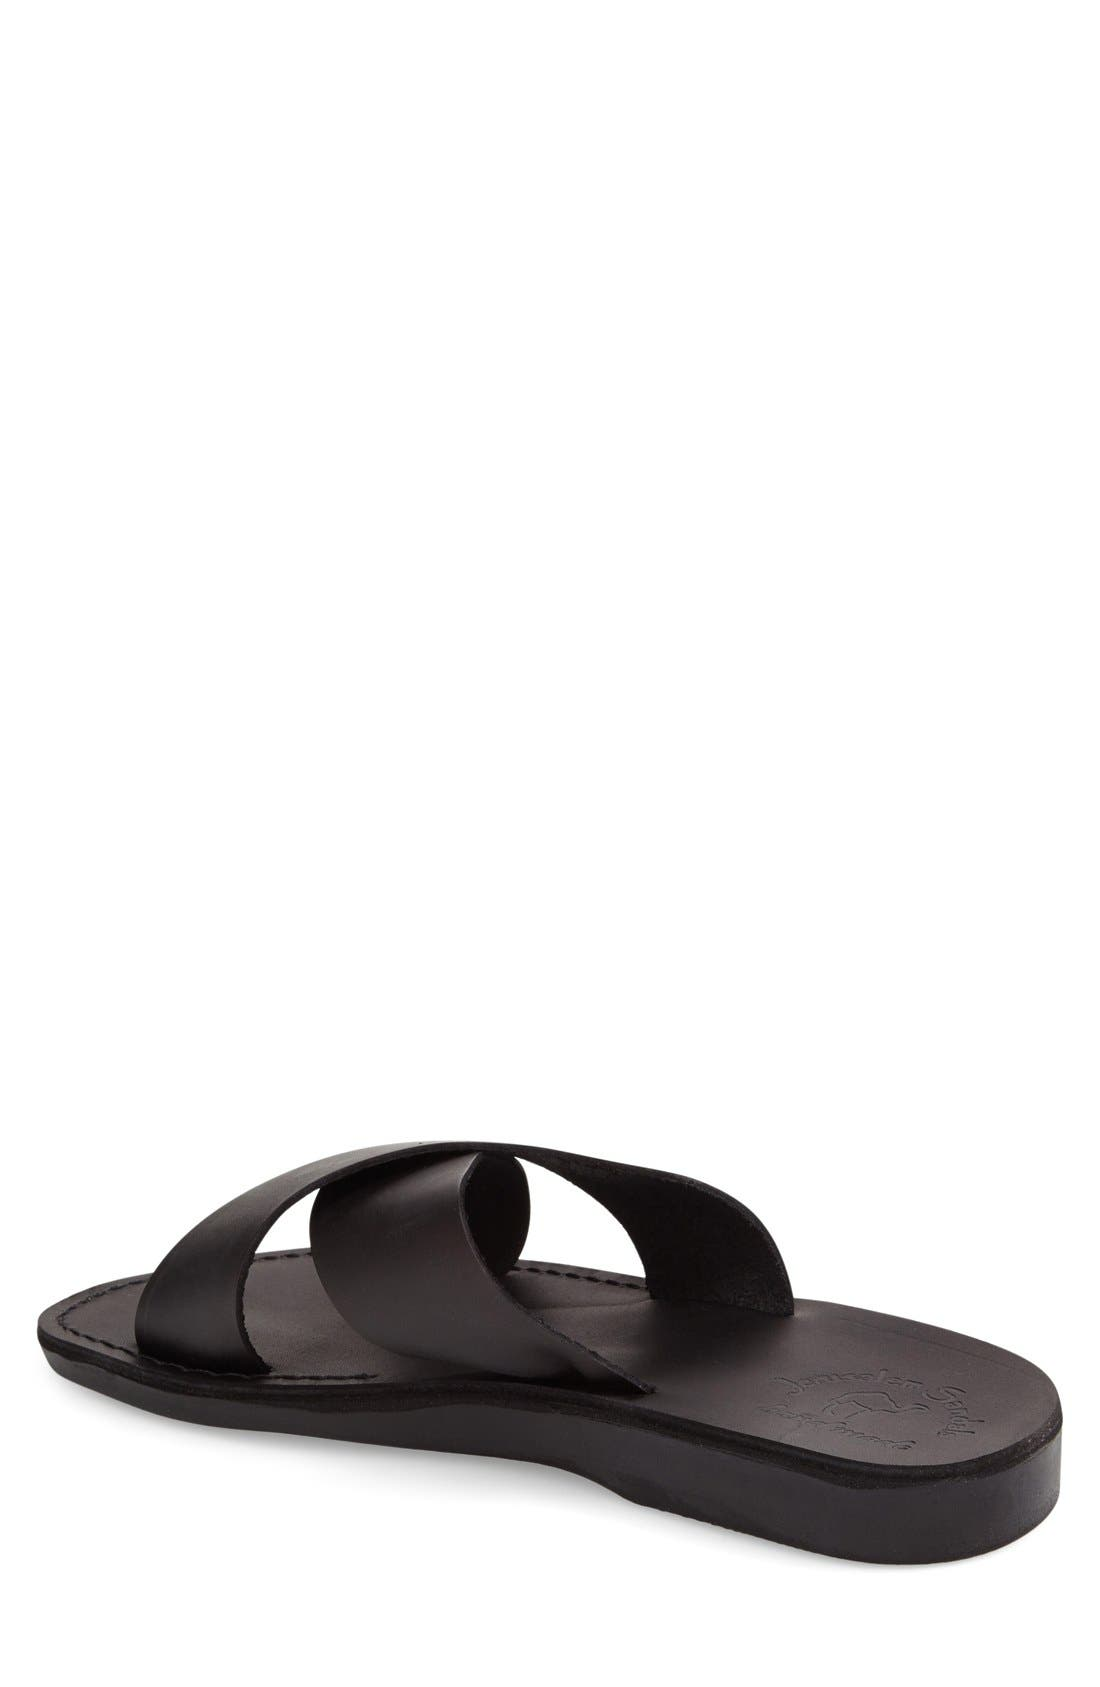 'Elan' Slide Sandal,                             Alternate thumbnail 5, color,                             BLACK LEATHER